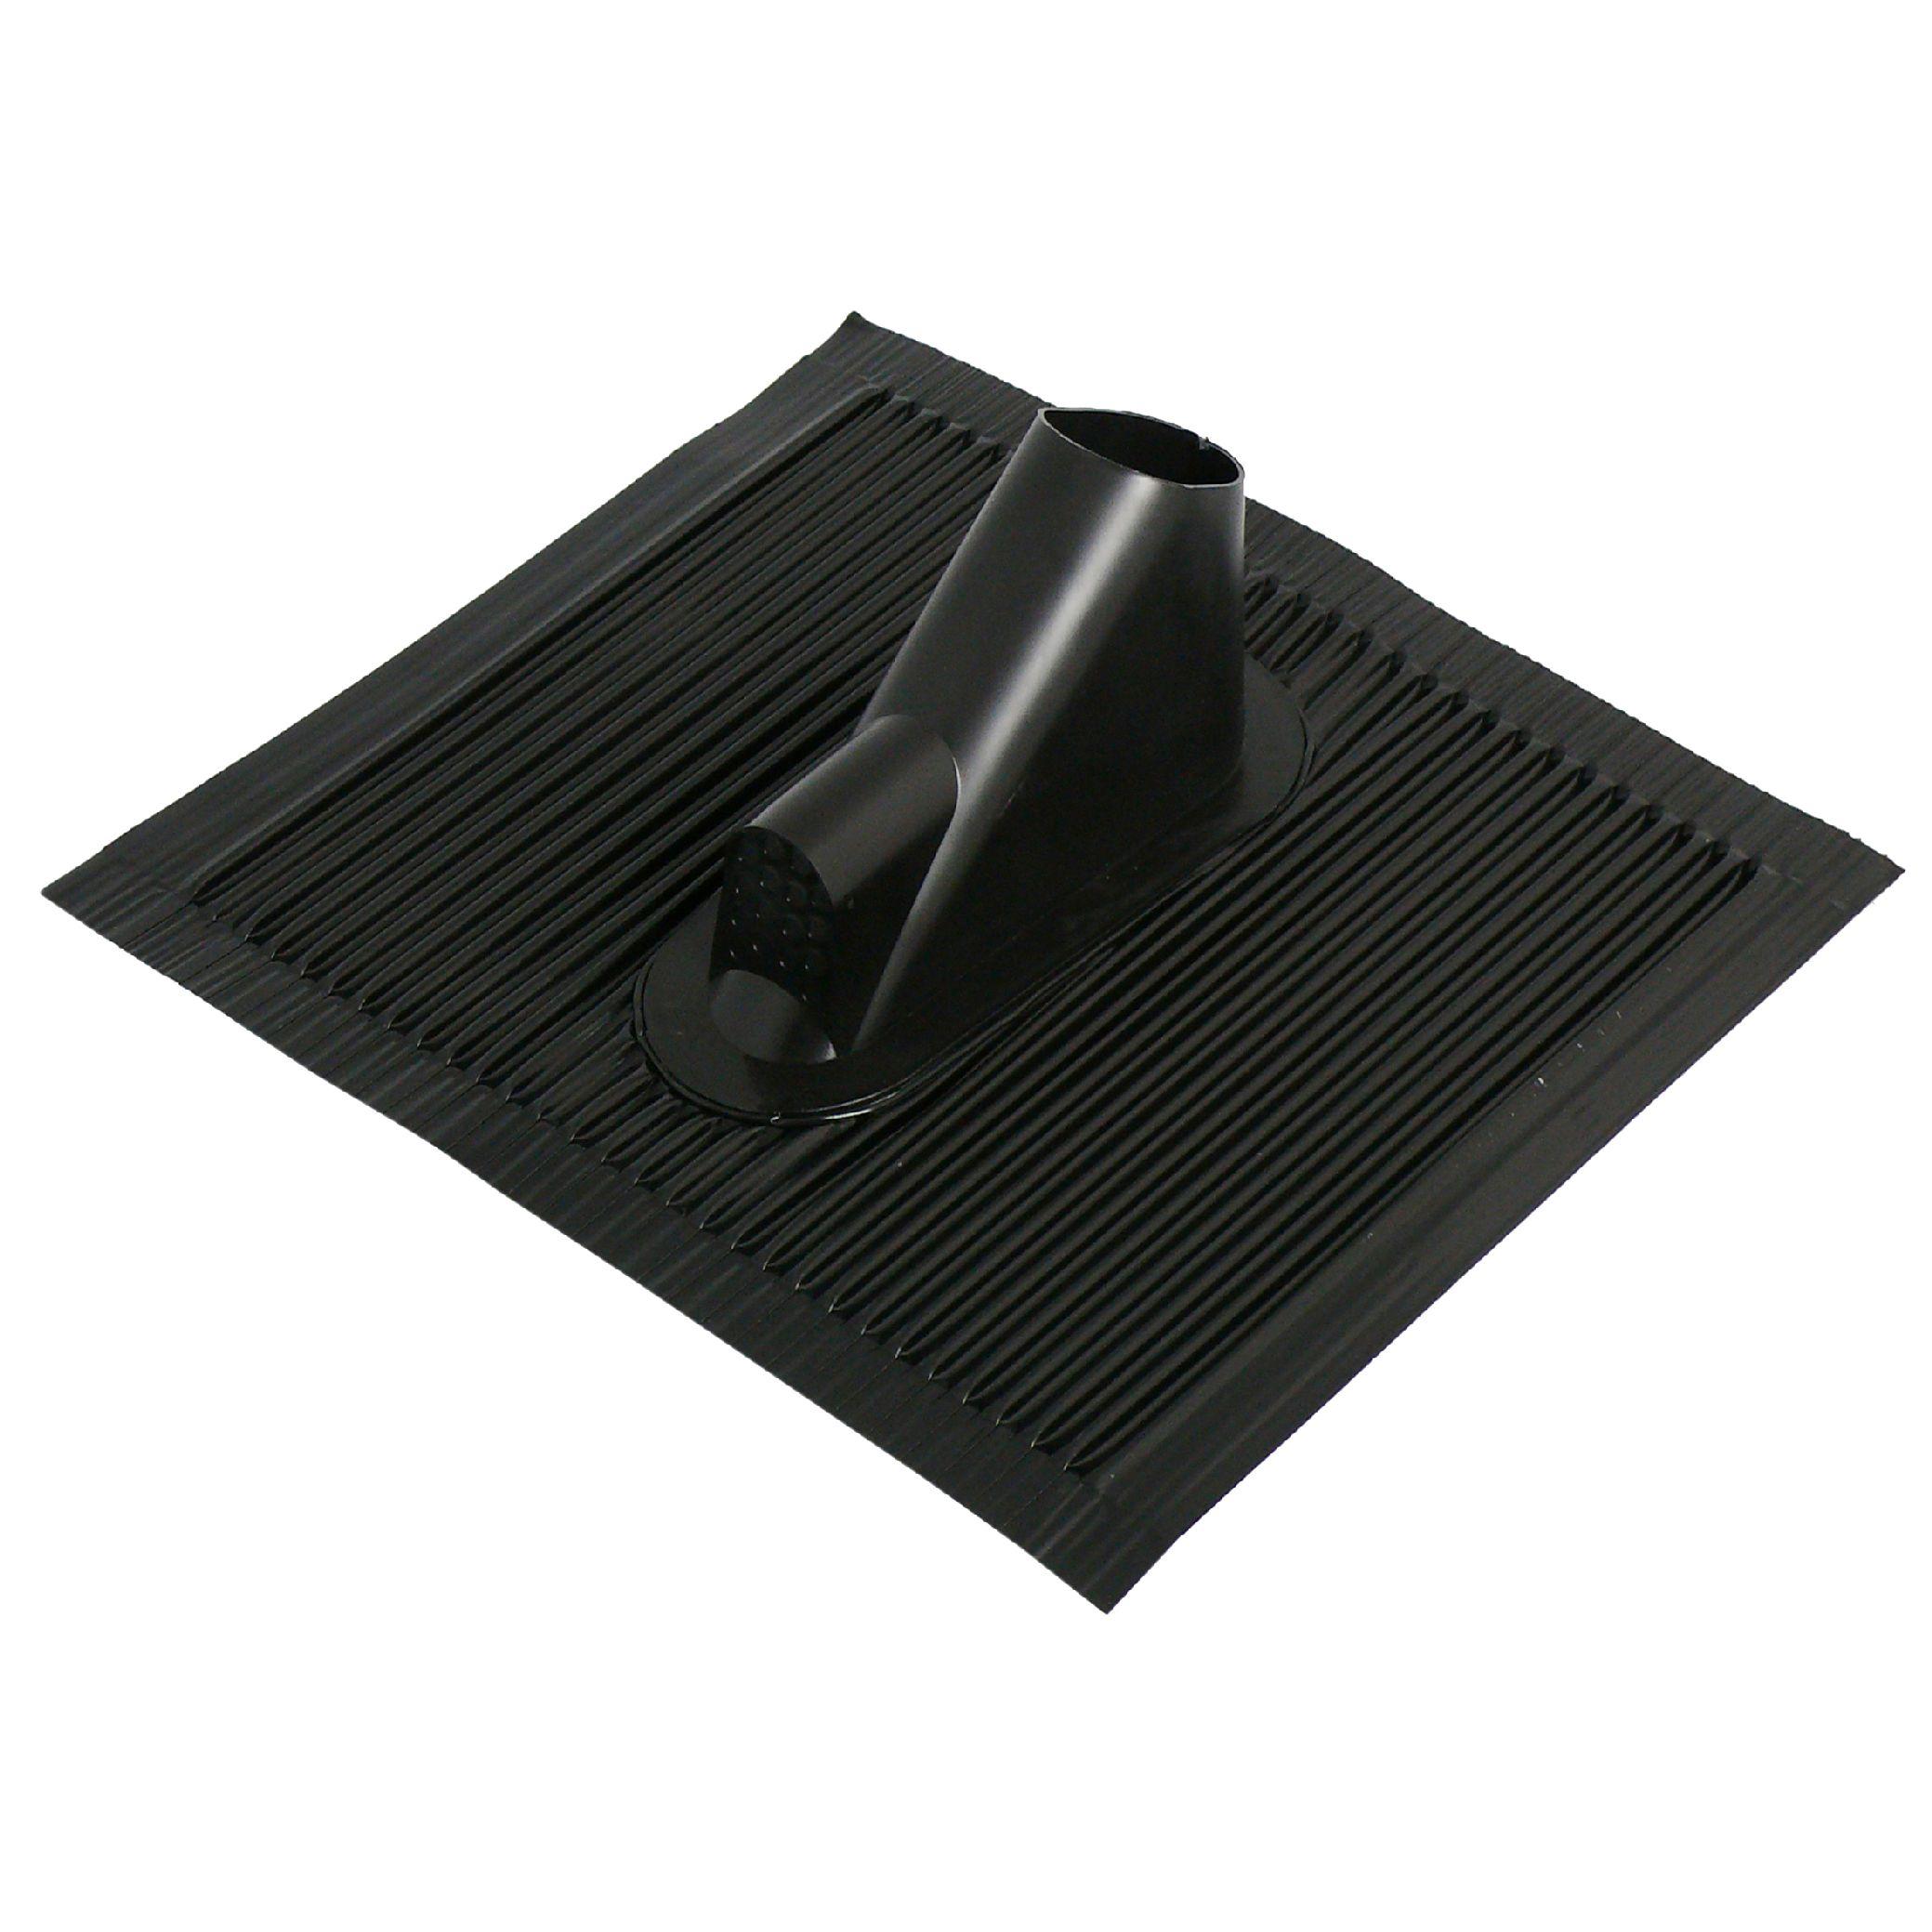 1 Stk SAT Dachziegel mit Kabeleinf., 45x50cm, Mast:38-60mm, Alu,sw HSATMZ01AS